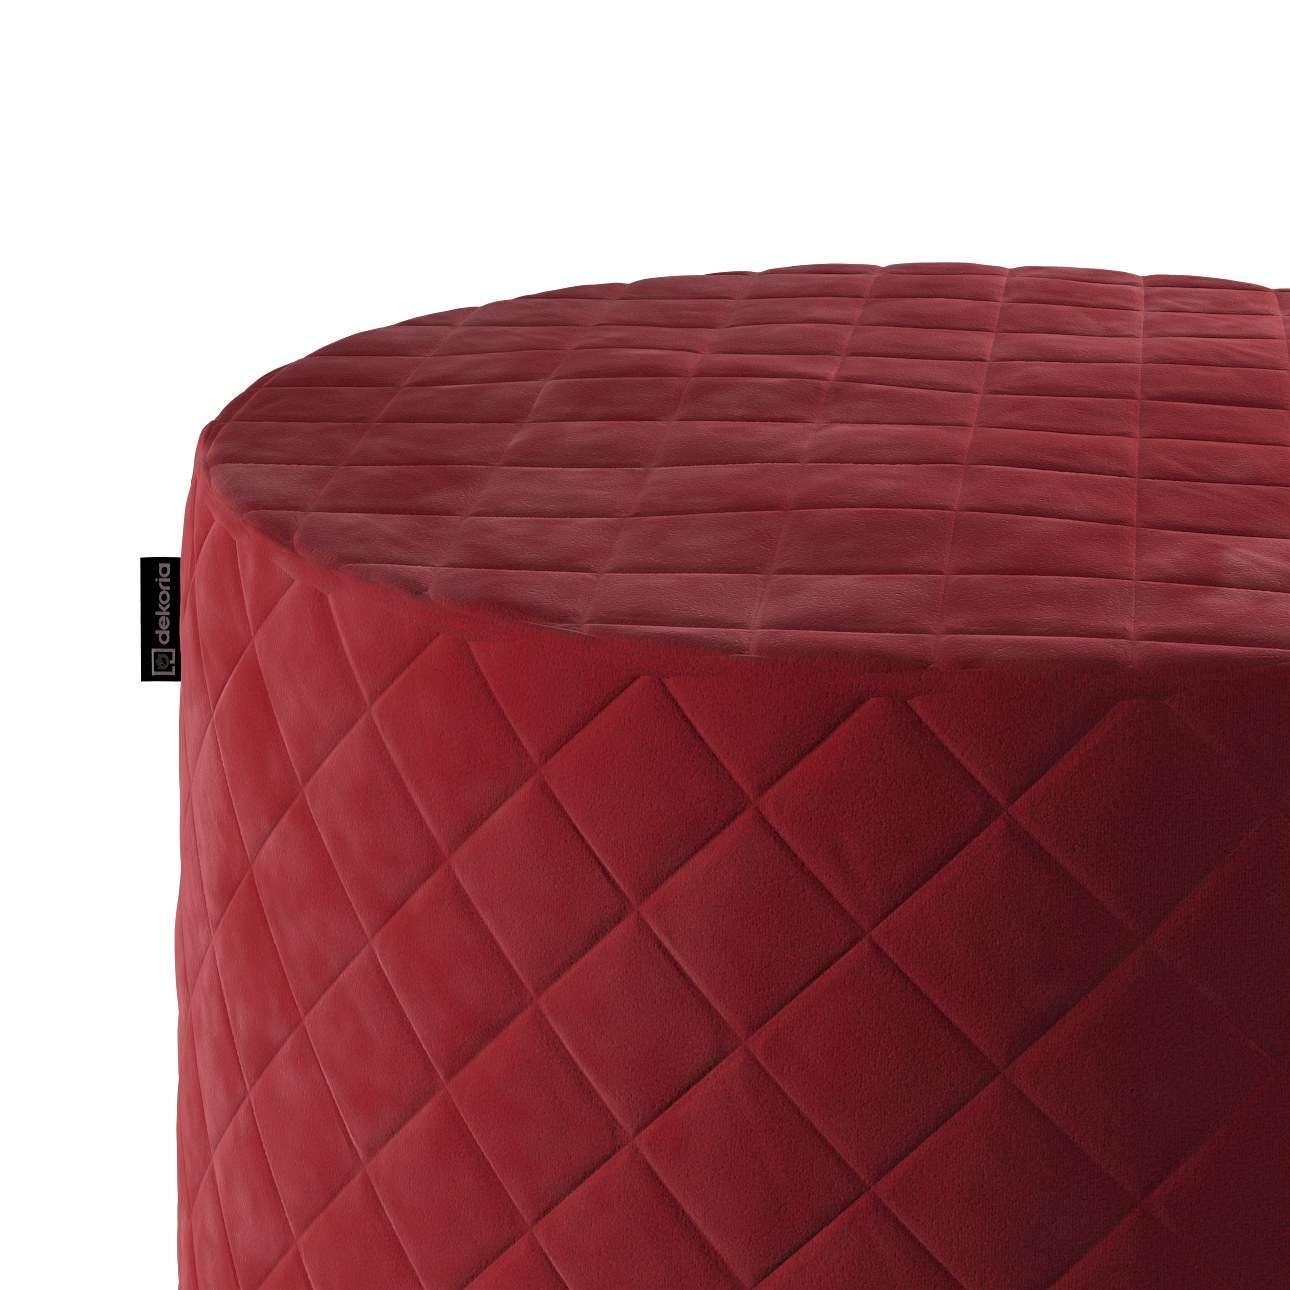 Puf Barrel pikowany w kolekcji Velvet, tkanina: 704-15